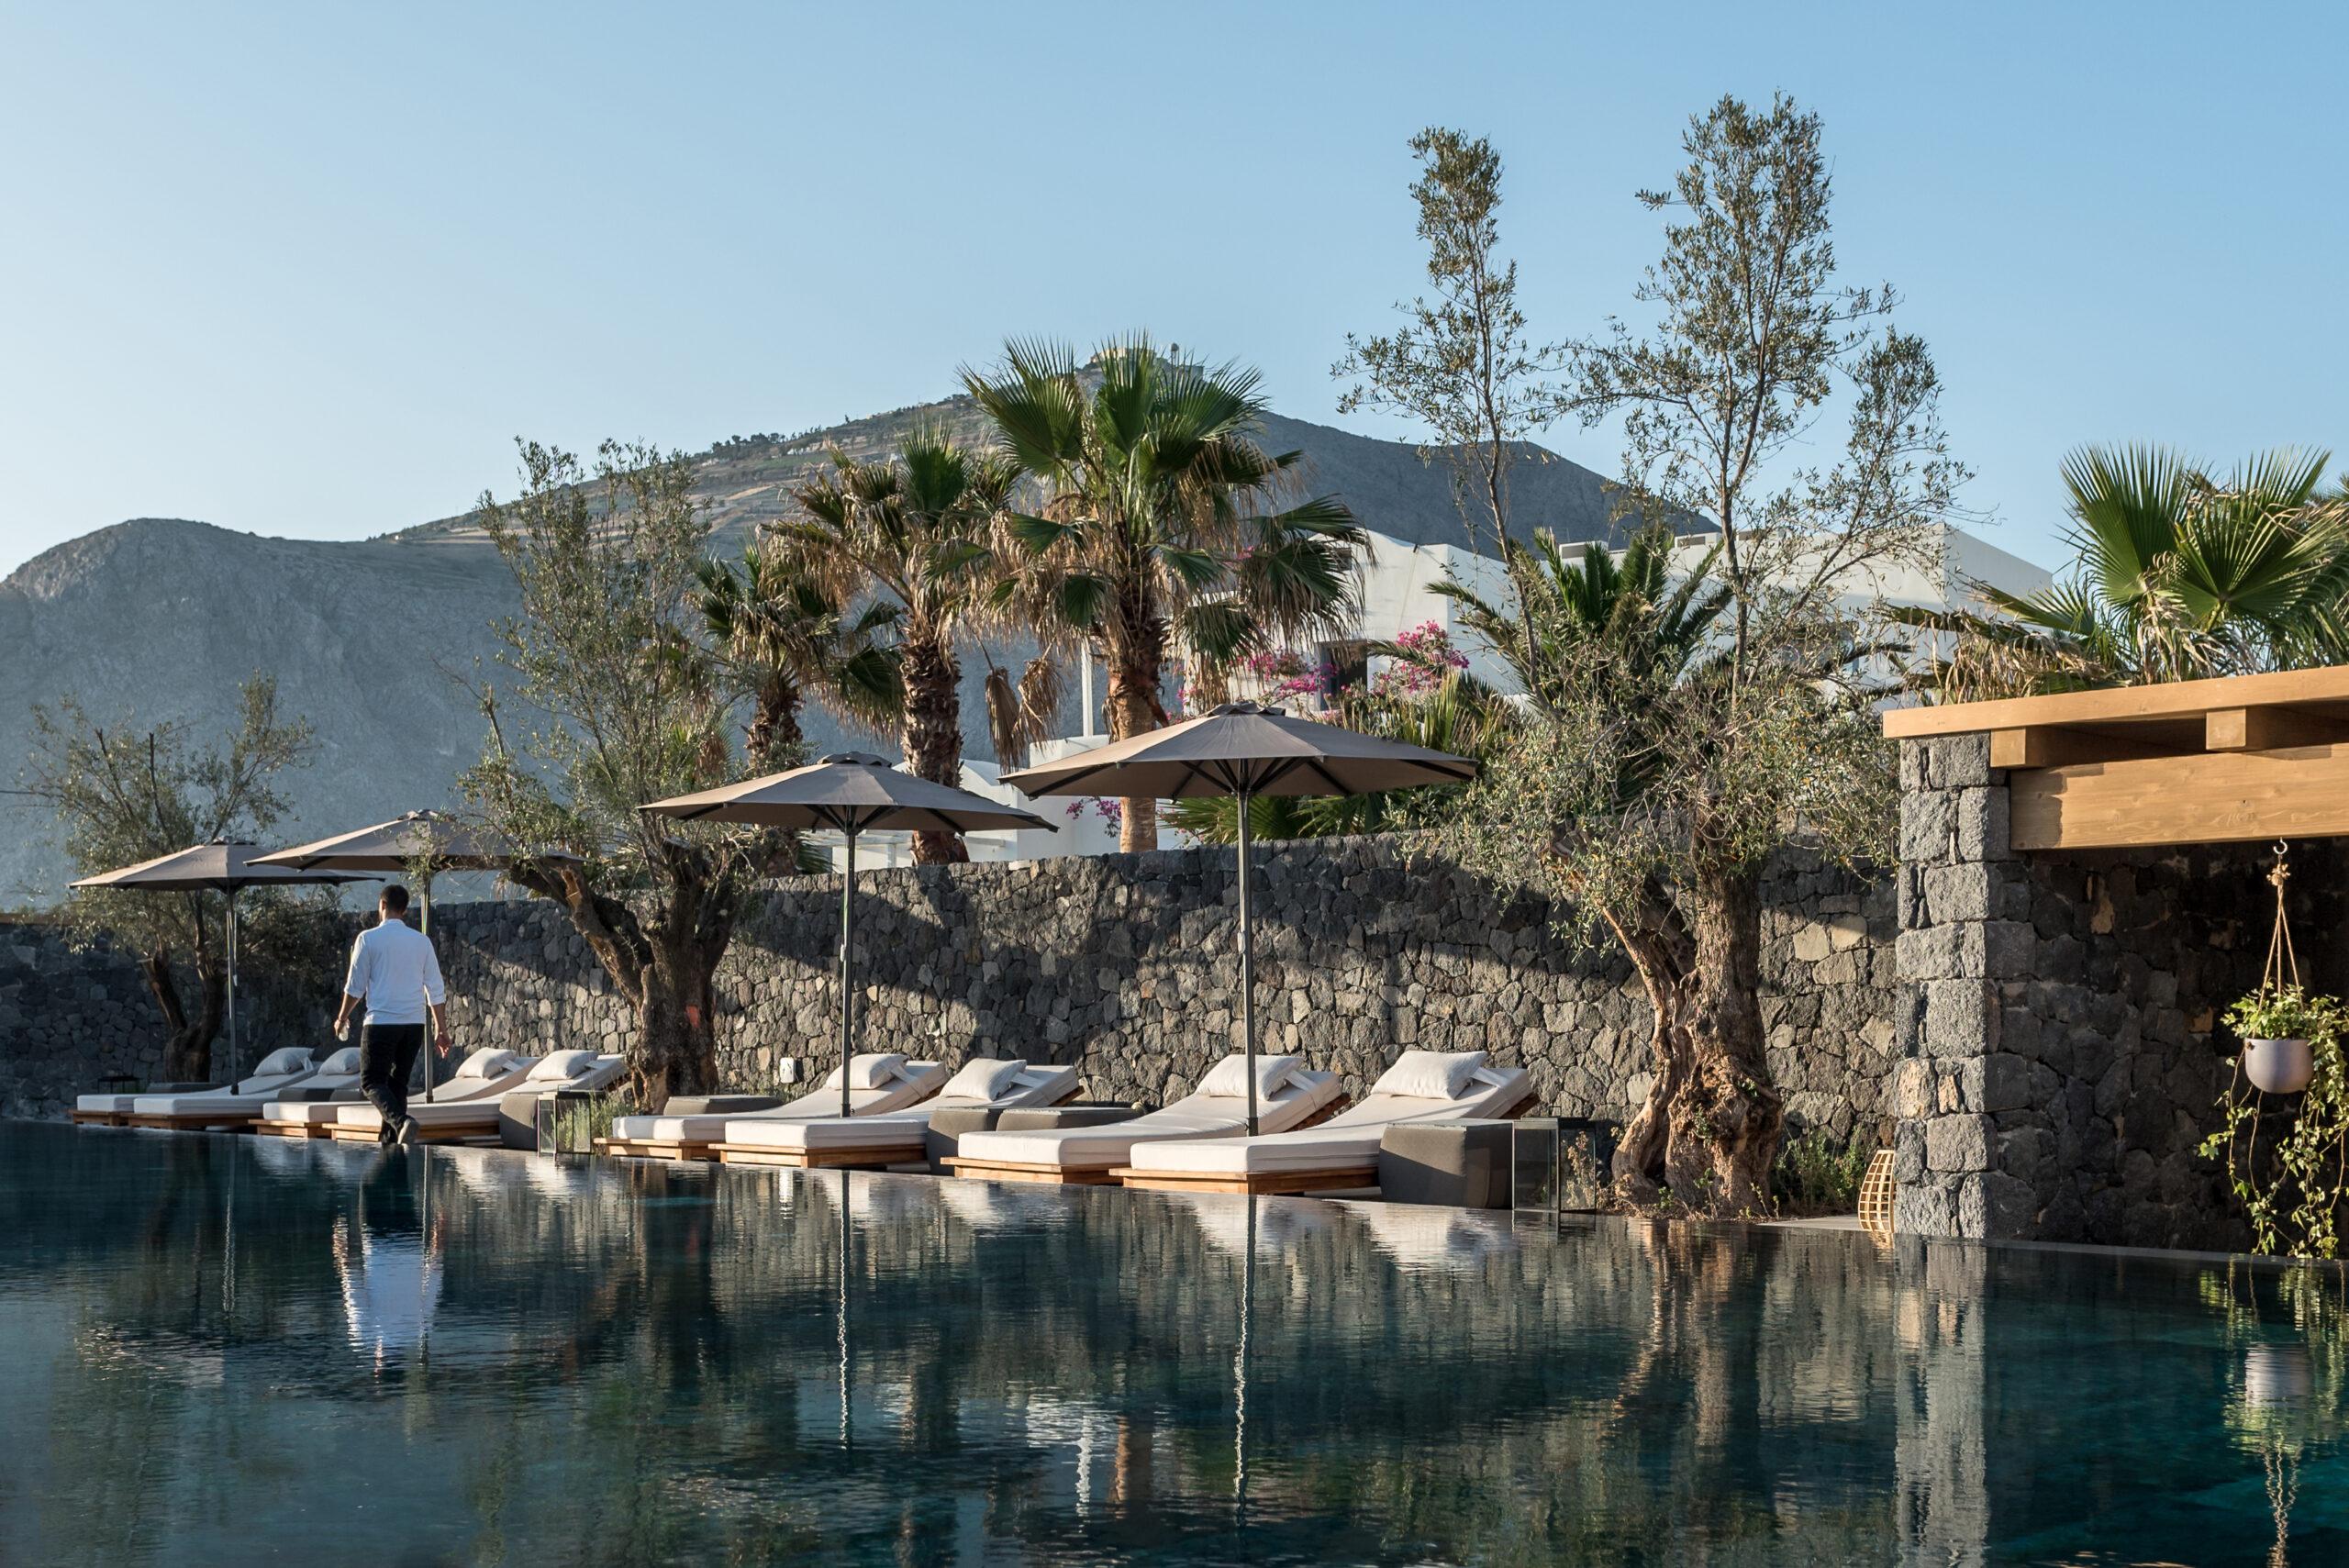 Outdoor swimming pool Istoria hotel Santorini Greece luxury villa hotel